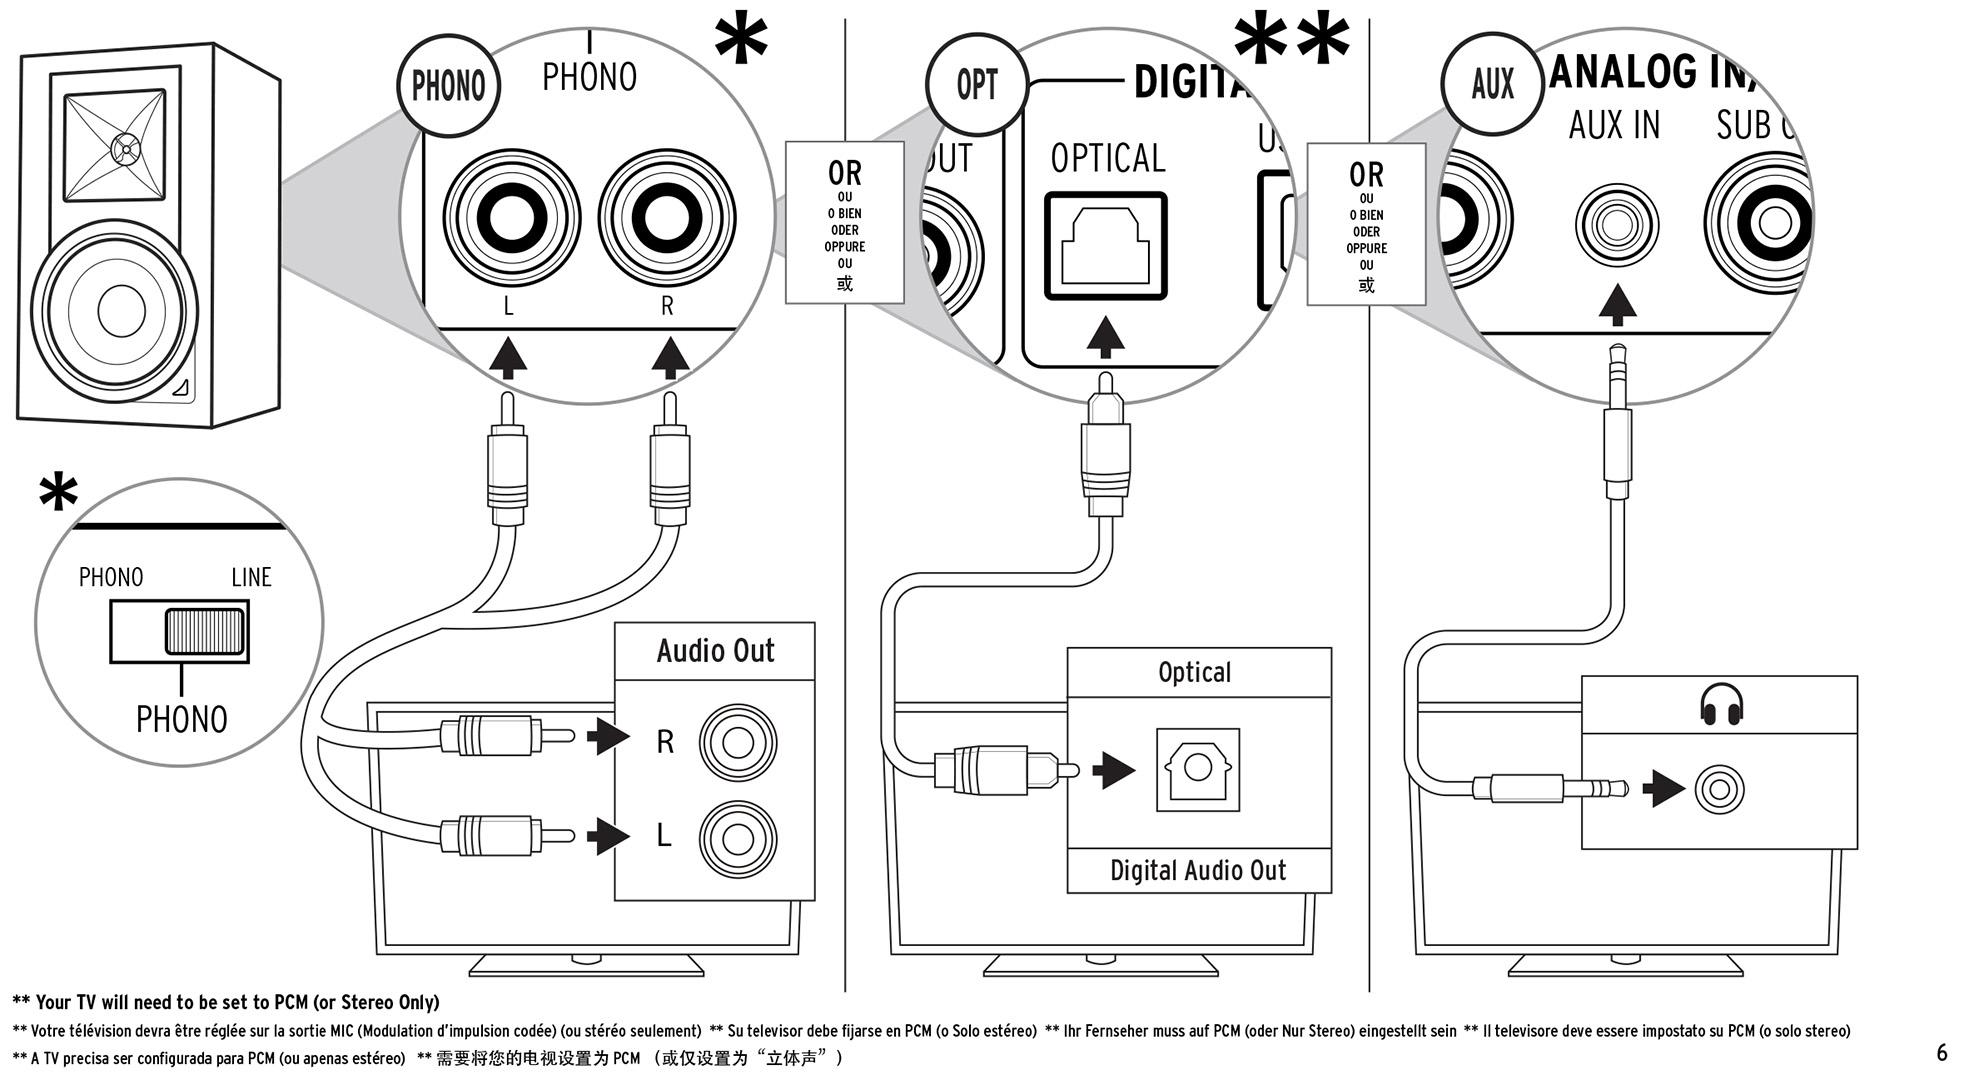 R-15PM-TV-AANSLUITEN Usb Computer Speaker Wiring Diagram on usb port wiring diagram, usb camera wiring diagram, bluetooth wiring diagram, headphone wiring diagram, usb circuit diagram, usb connector wiring diagram, headset wiring diagram, usb hub wiring diagram, usb cable diagram, usb power diagram, sound bar wiring diagram, usb speaker cable, usb speaker system, card reader wiring diagram, usb charger wiring diagram, game controller wiring diagram, loudspeaker wiring diagram, jbl speakers wiring diagram, usb mouse wiring diagram,